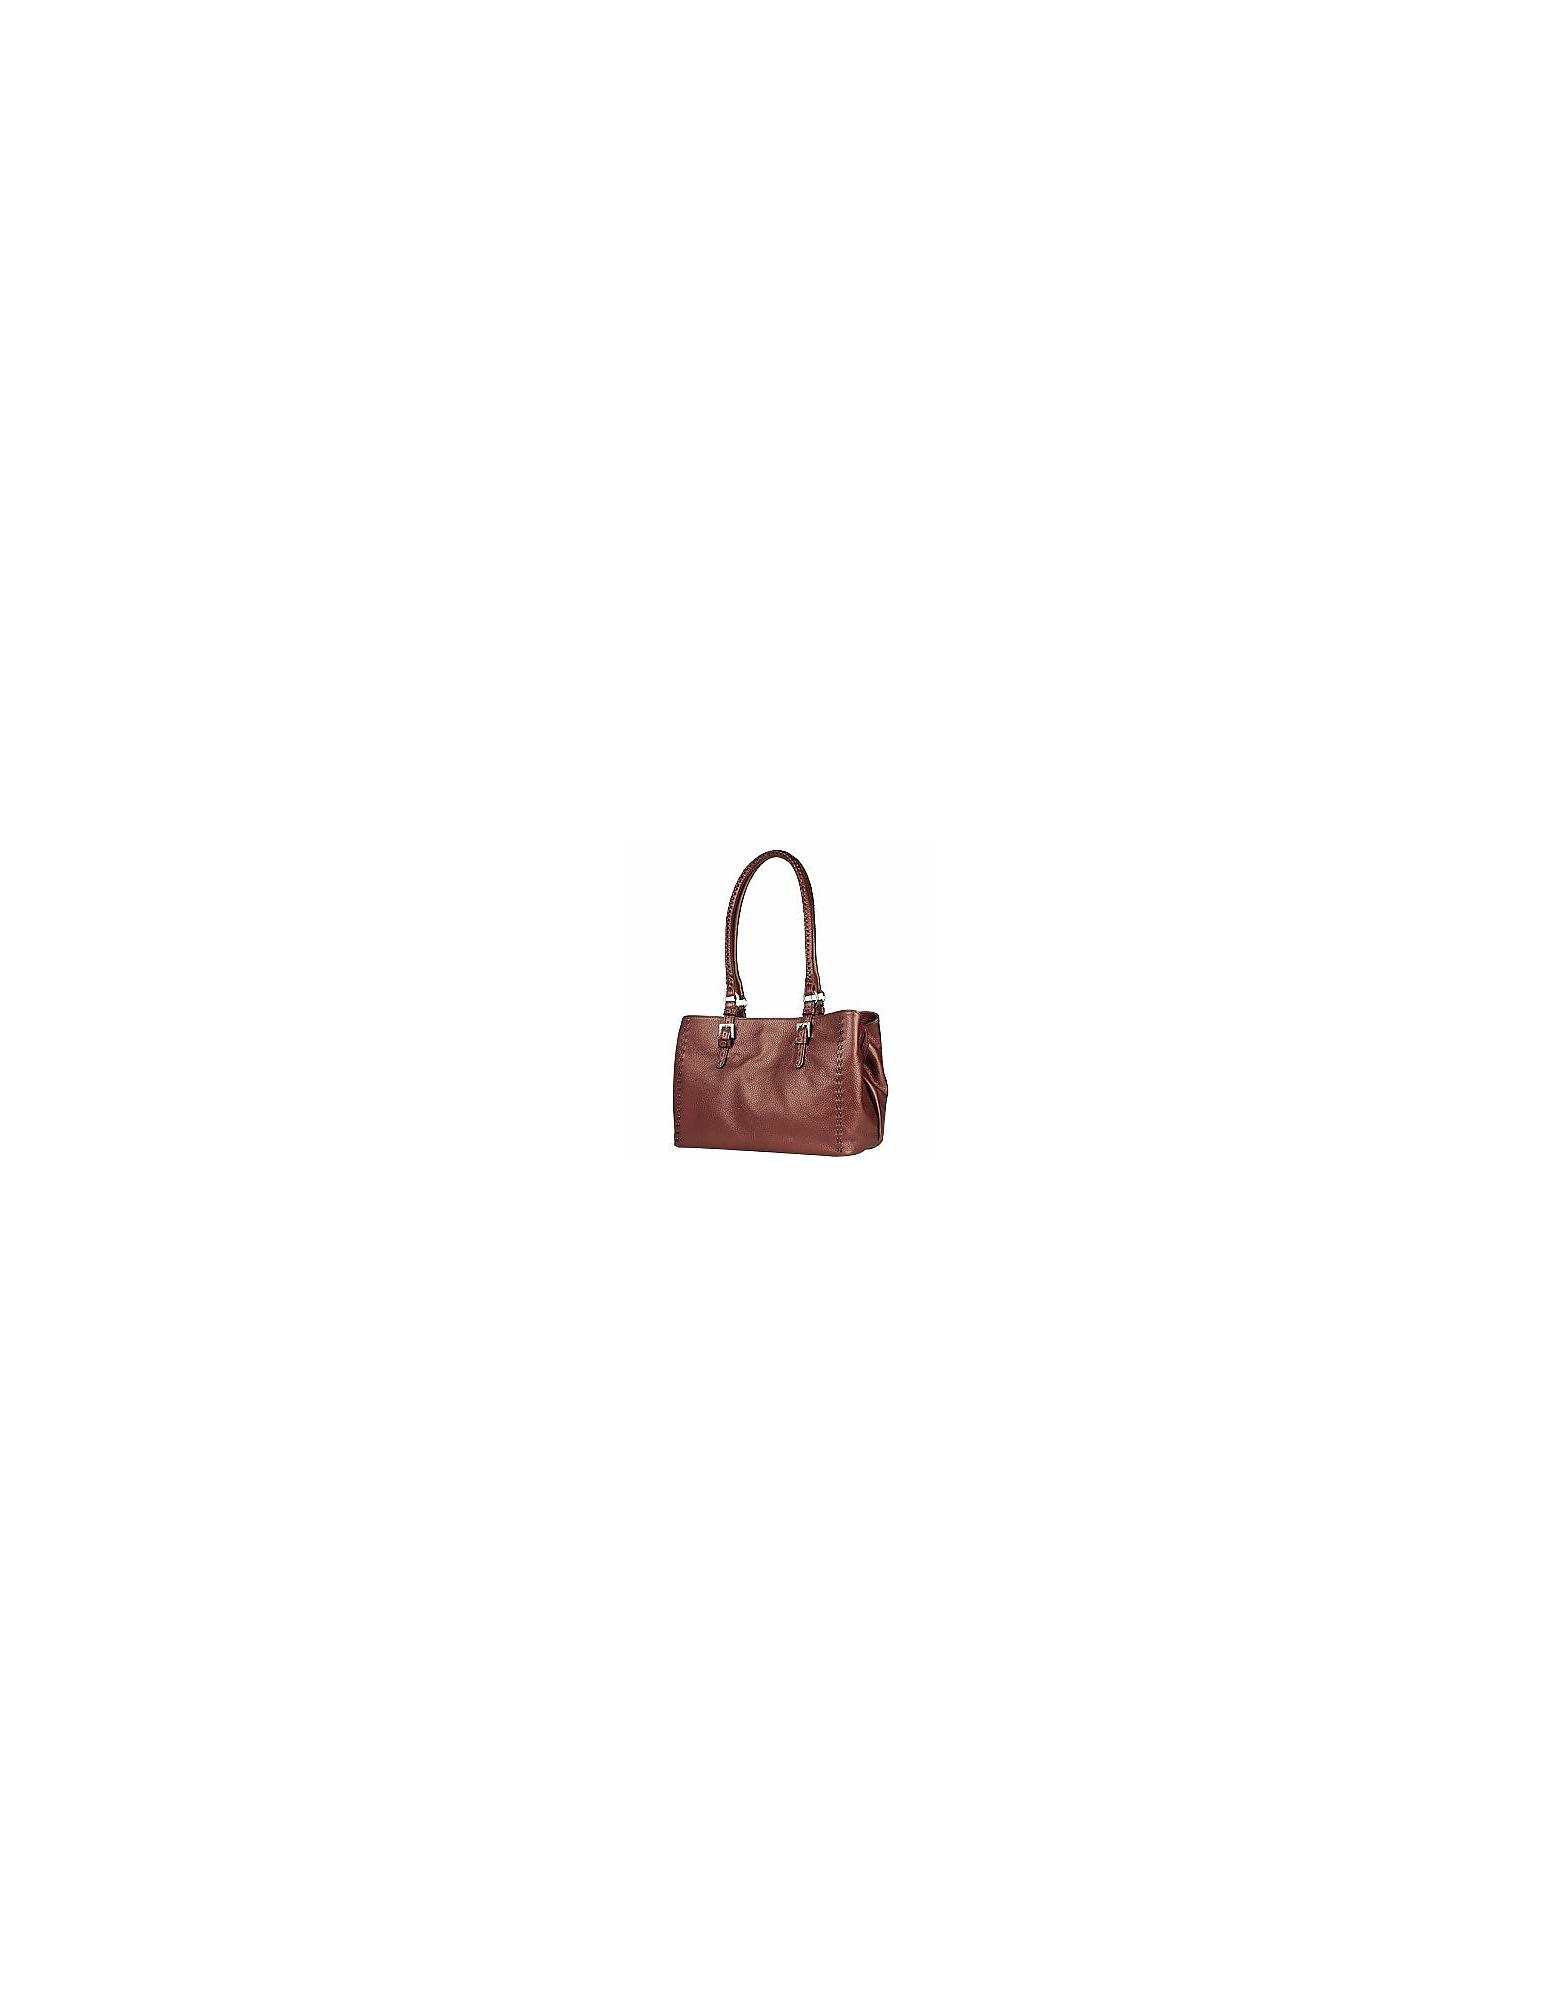 Fontanelli Handbags, Metallic Burgundy Stitched Soft Leather Satchel Bag